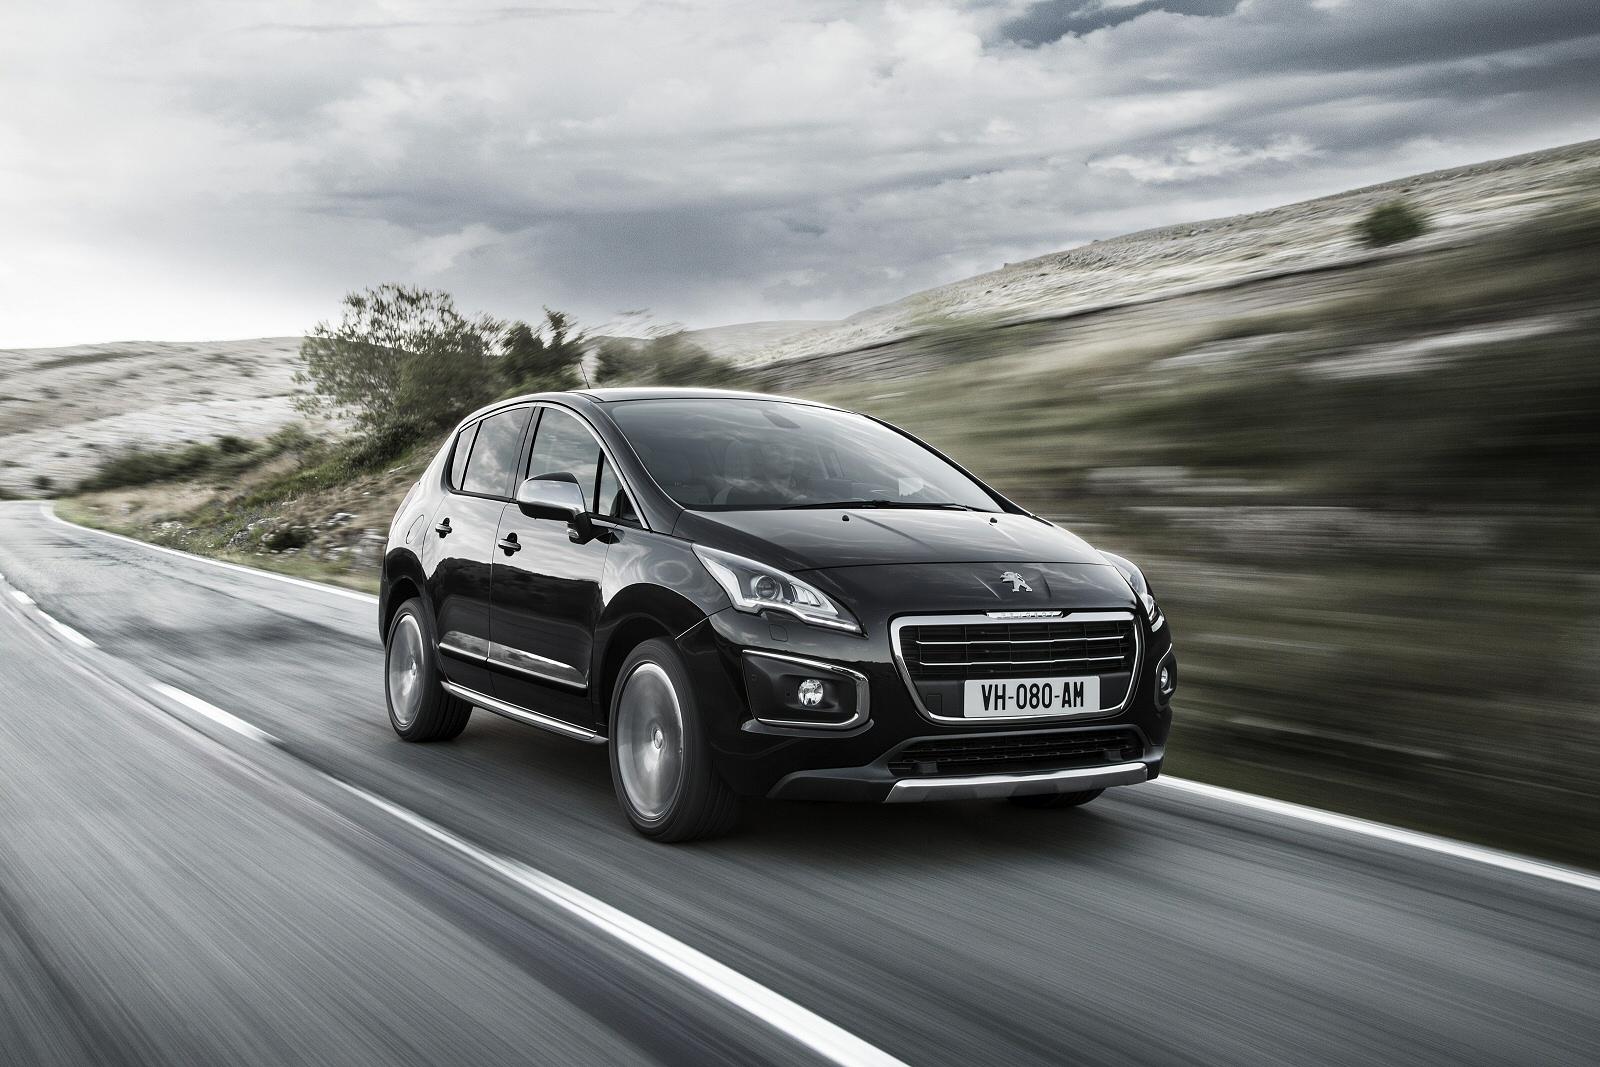 Front View 2014 Peugeot 3008